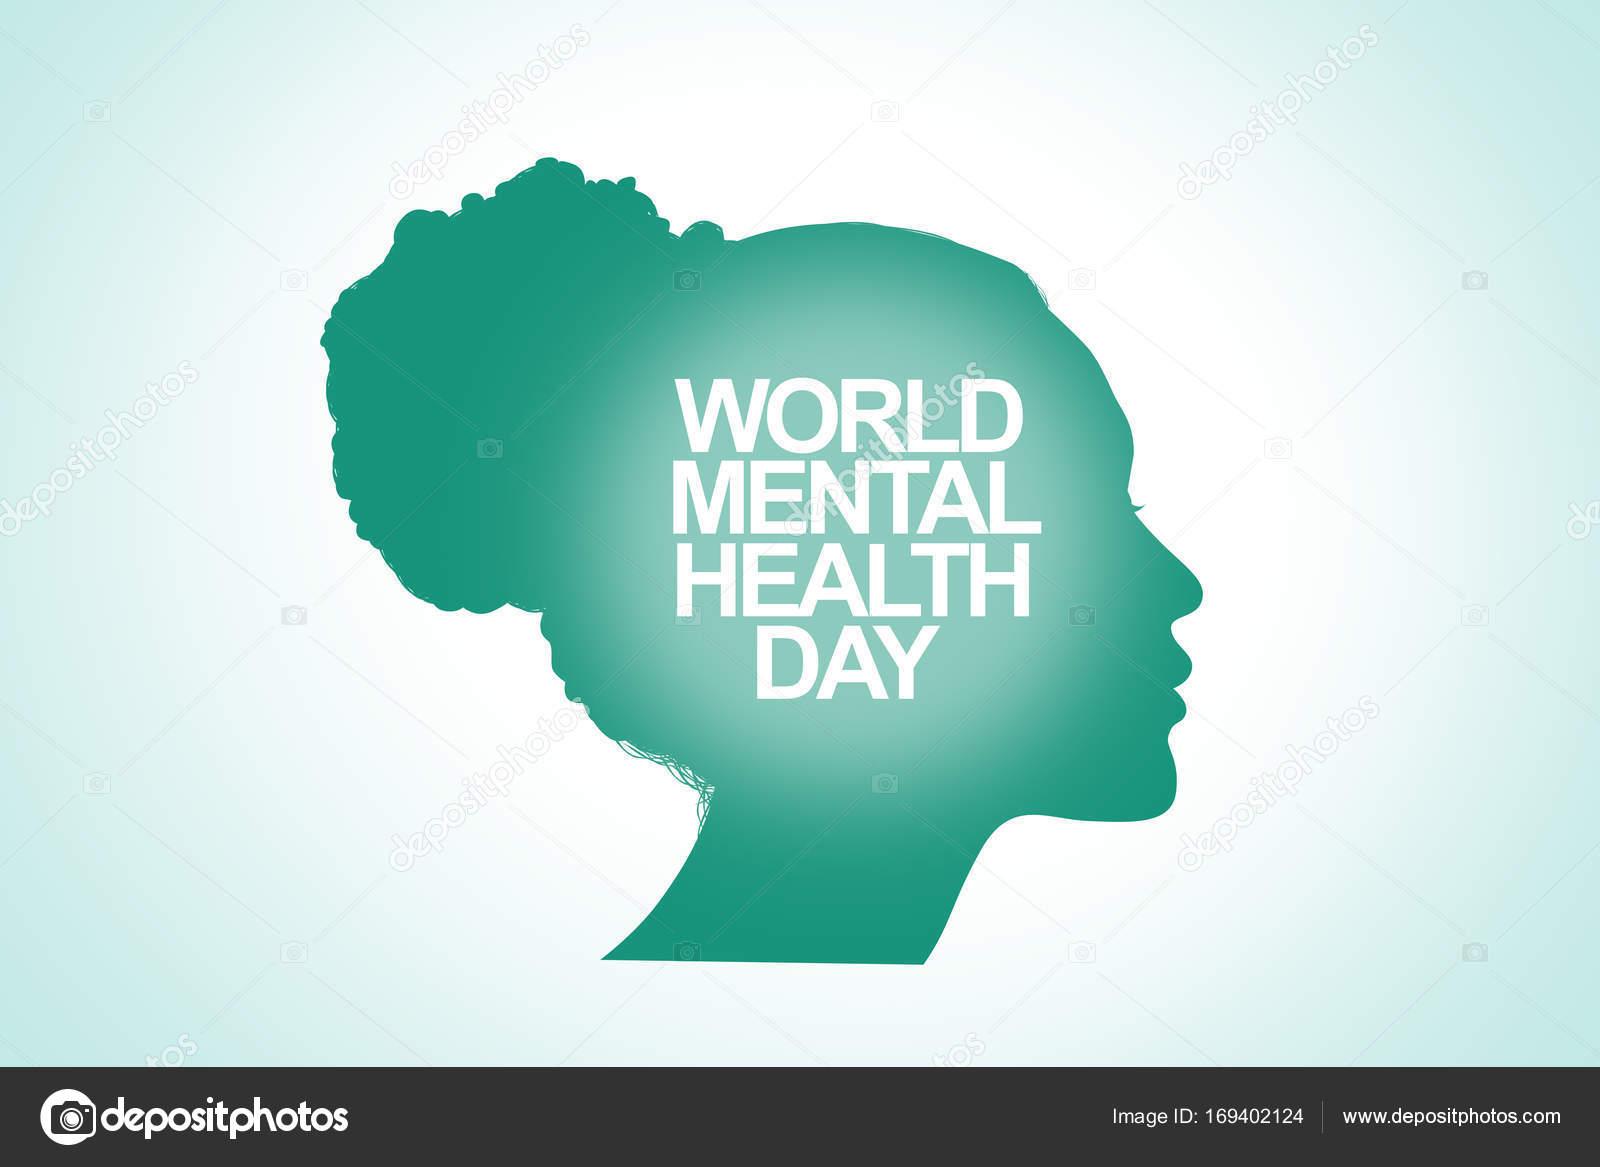 World Mental Health Day Banner Illustration Stock Photo C Tiagoz 169402124